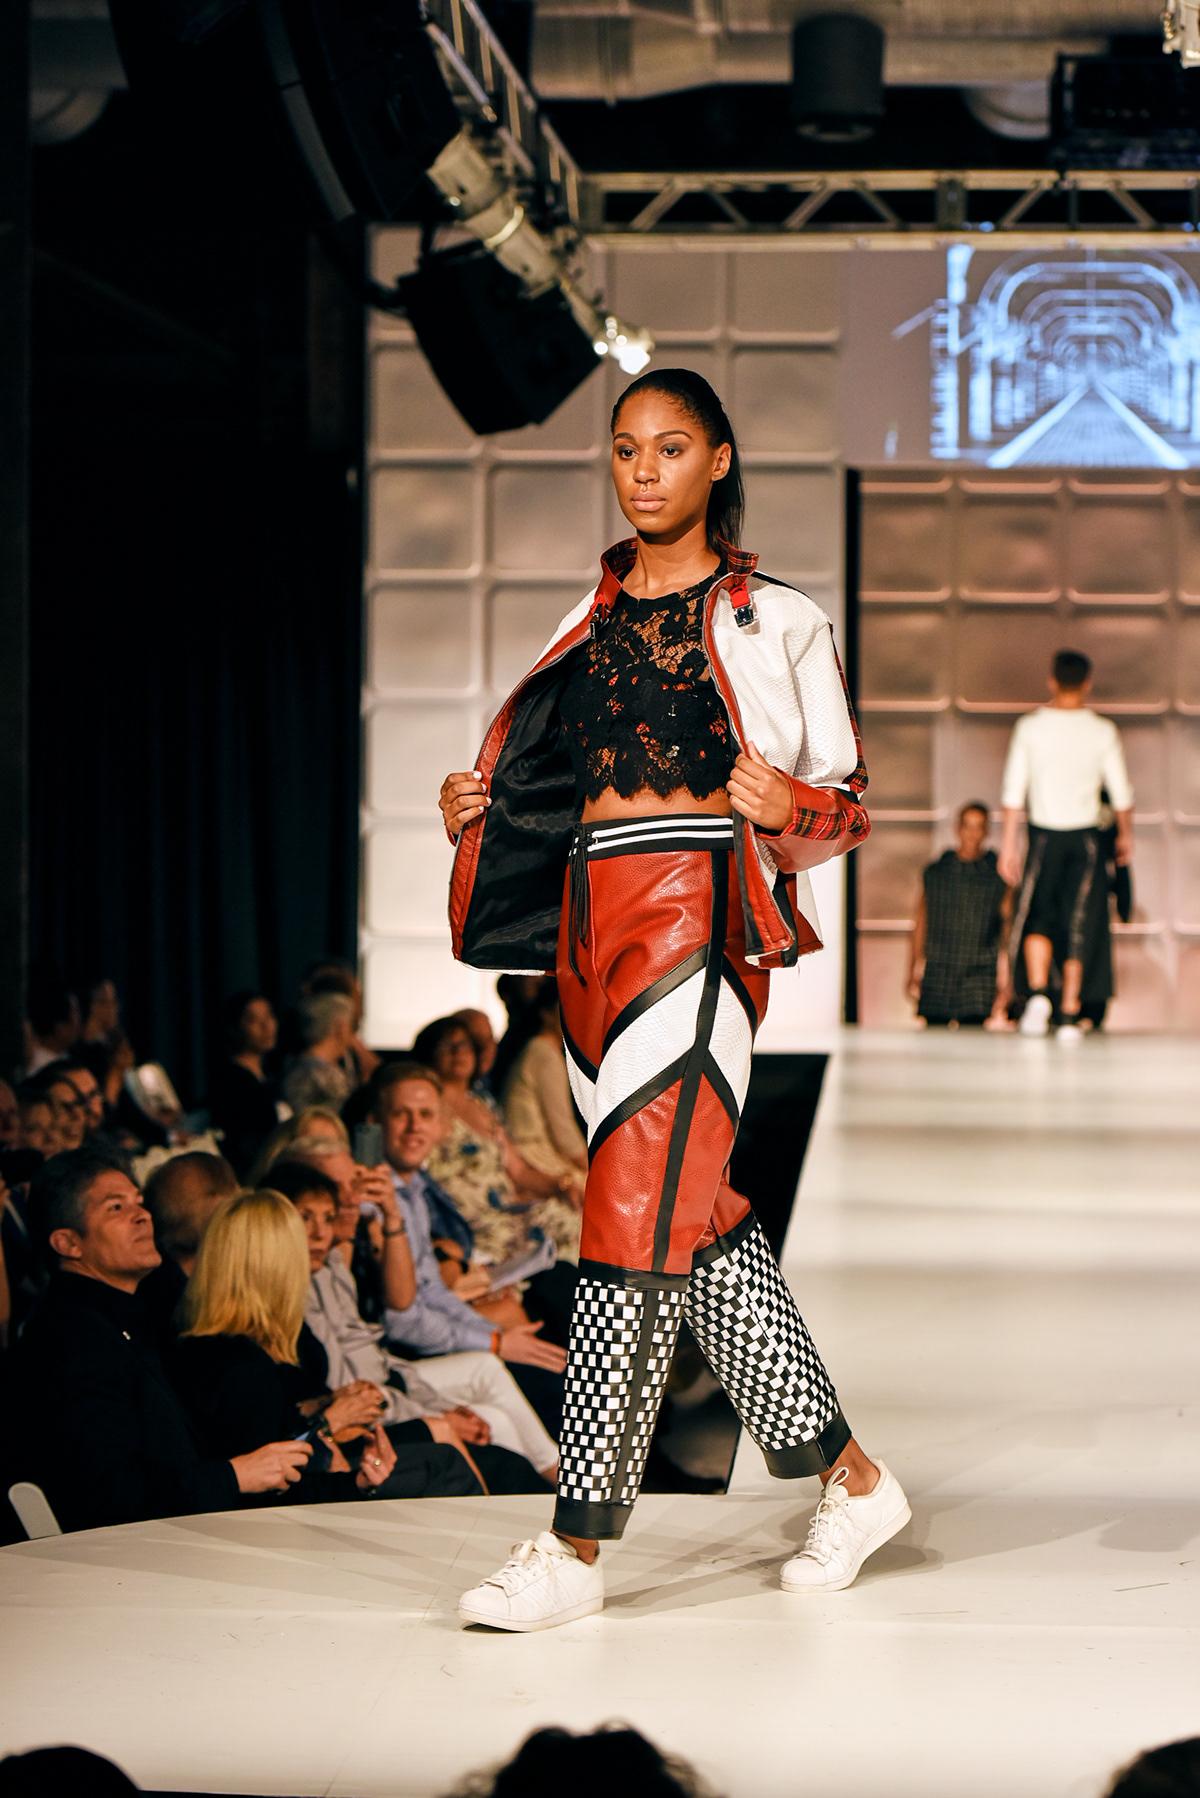 Drexel University Fashion Show 2018 On Behance